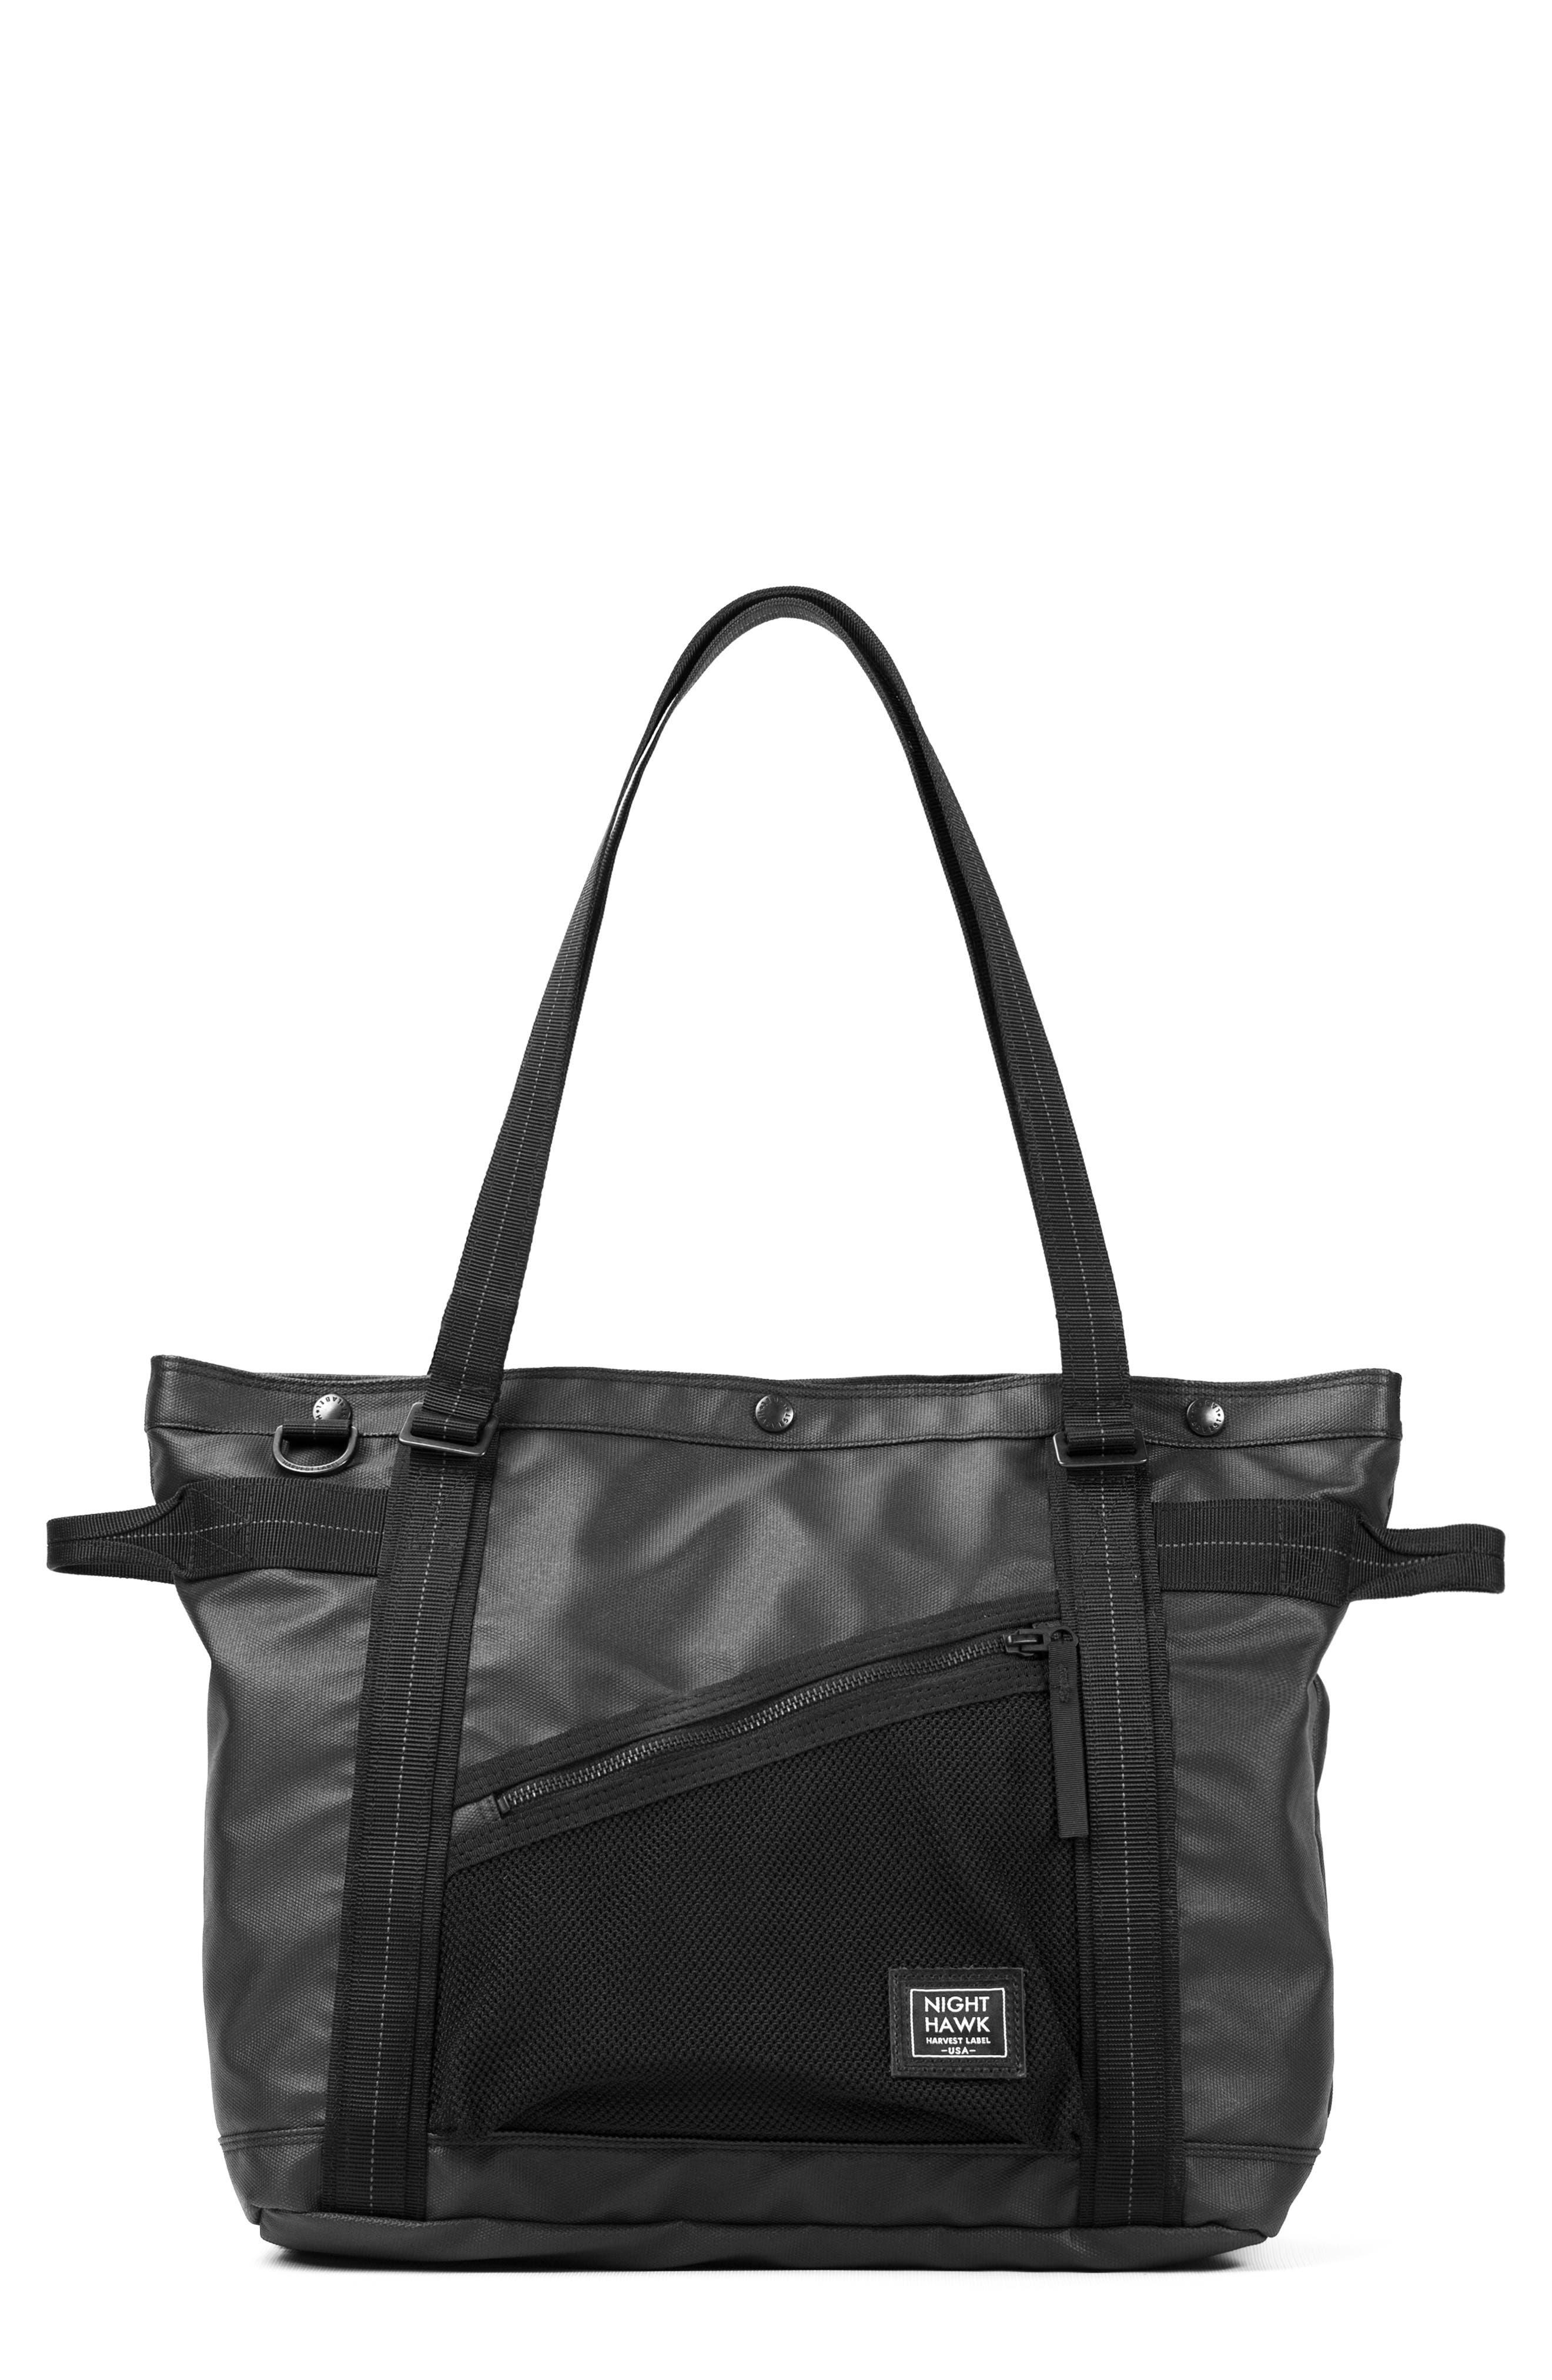 'NightHawk' Tote Bag,                             Alternate thumbnail 3, color,                             BLACK